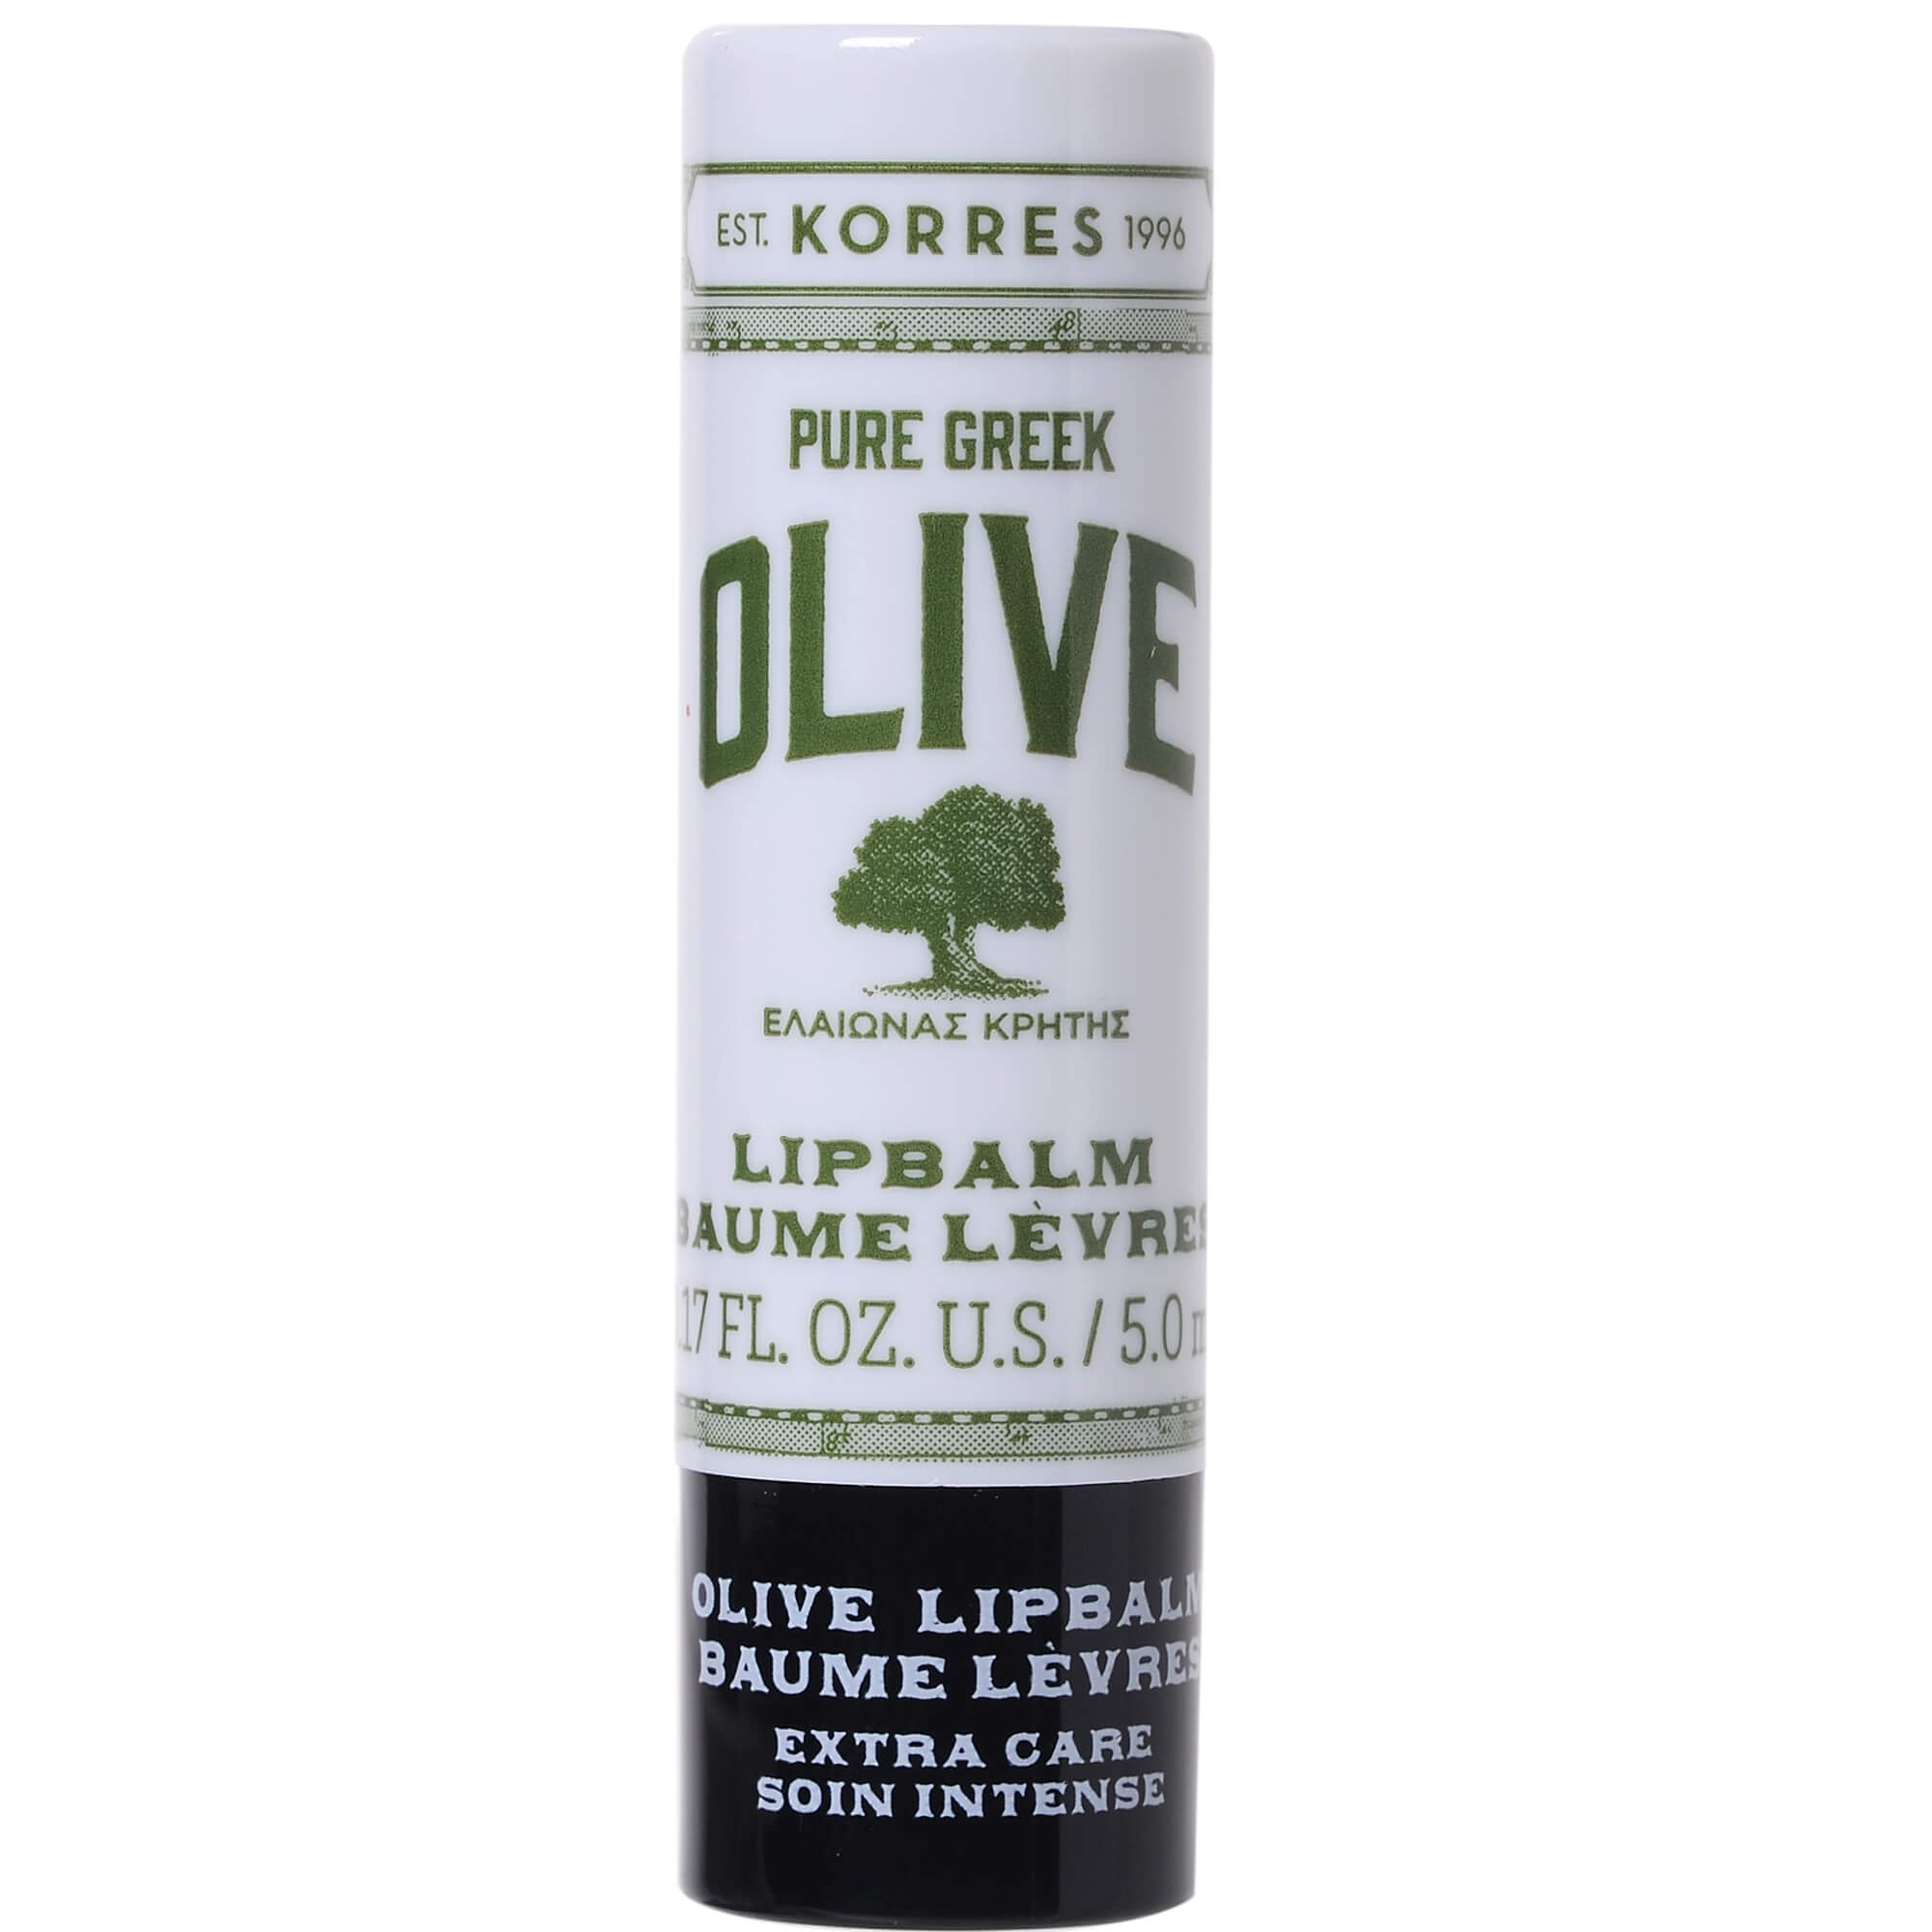 Korres Pure Greek Olive Extra Care Lip Balm Θρέψη, Ενυδάτωση στα Ξηρά Σκασμένα Χείλη με Αλόη και Shea Butter 5ml